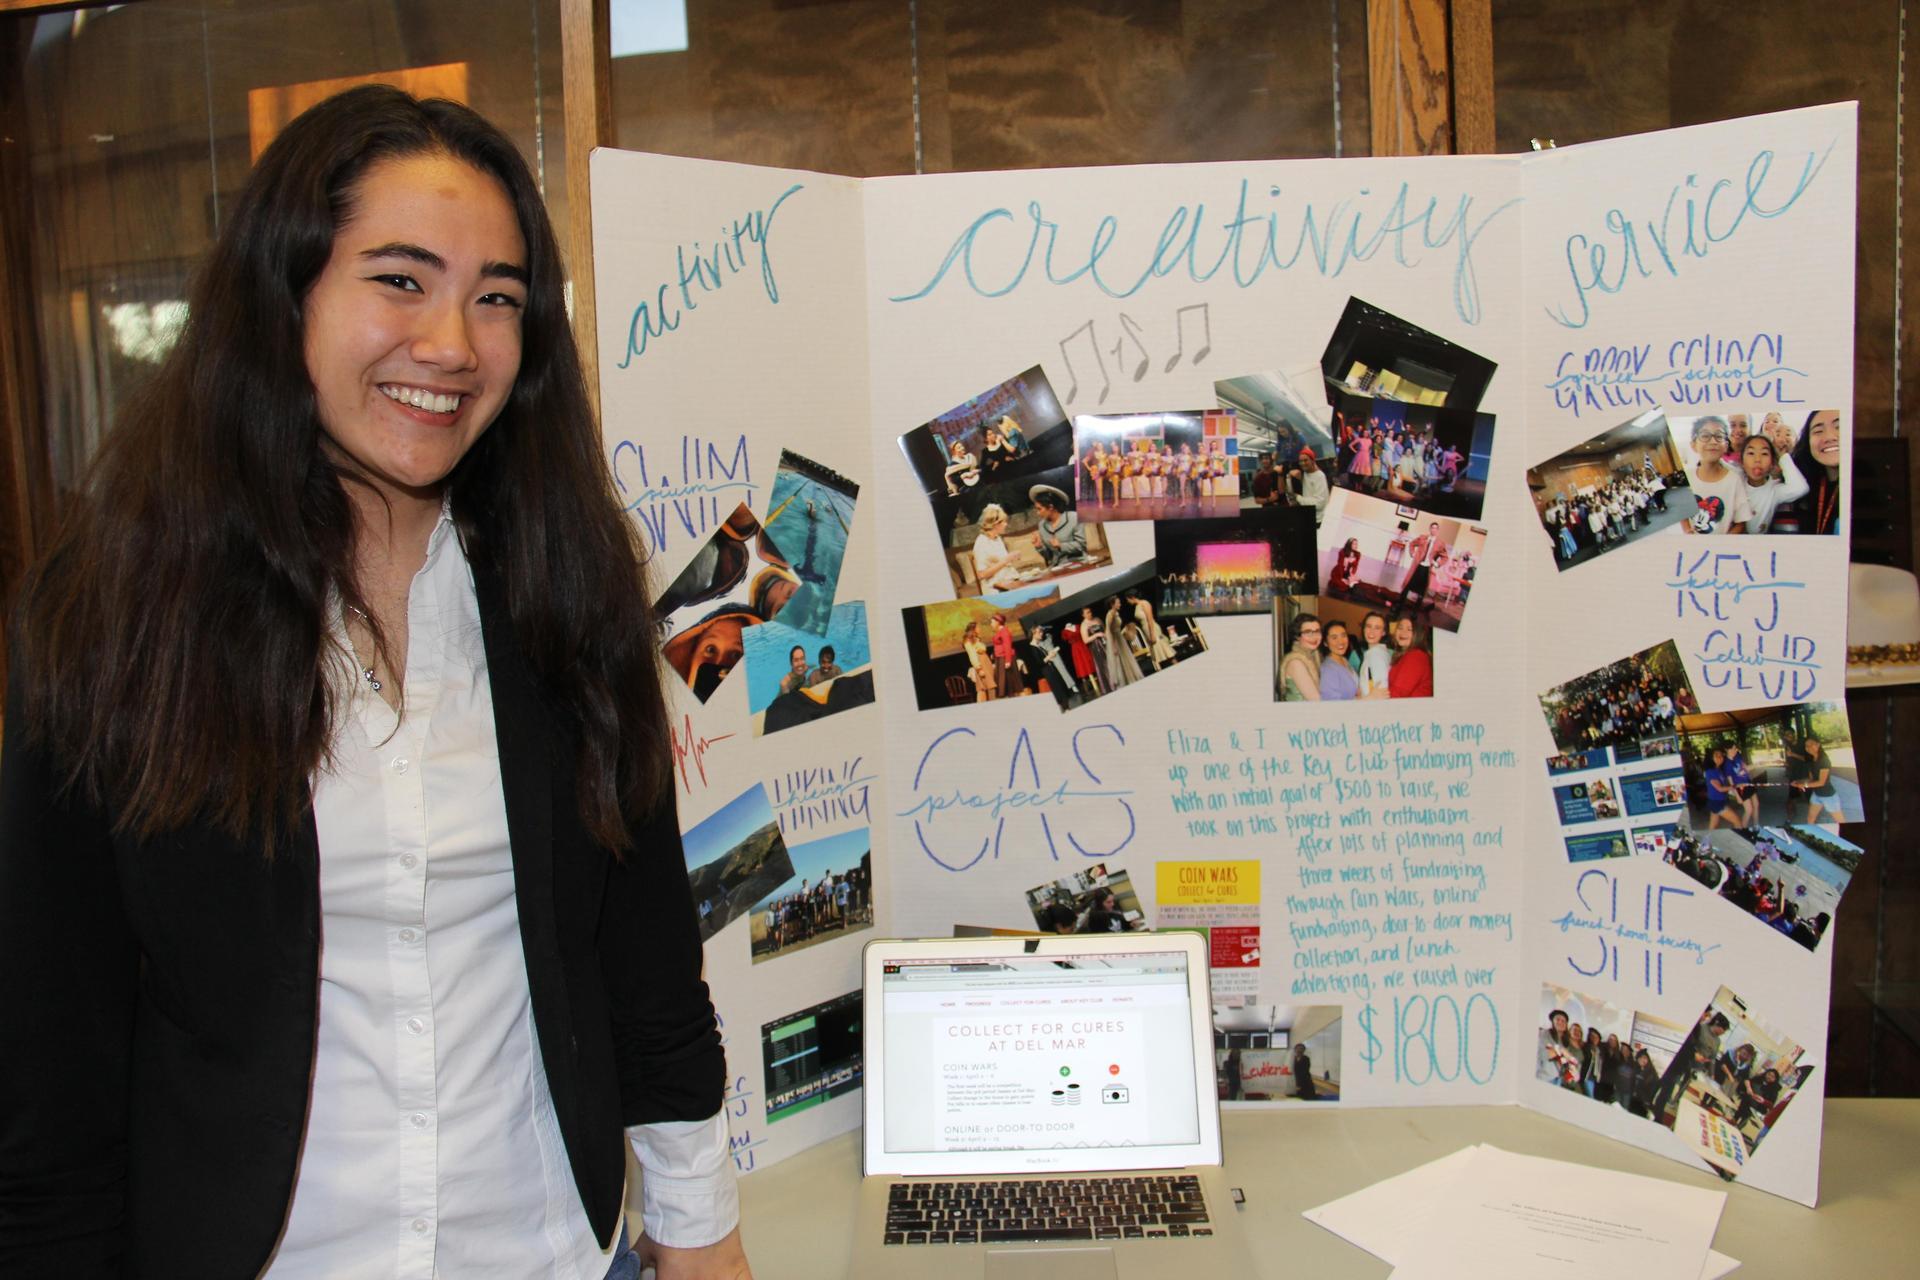 Image of IB Student - Jordan - showcasing her Creativity, Activity & Service experiences